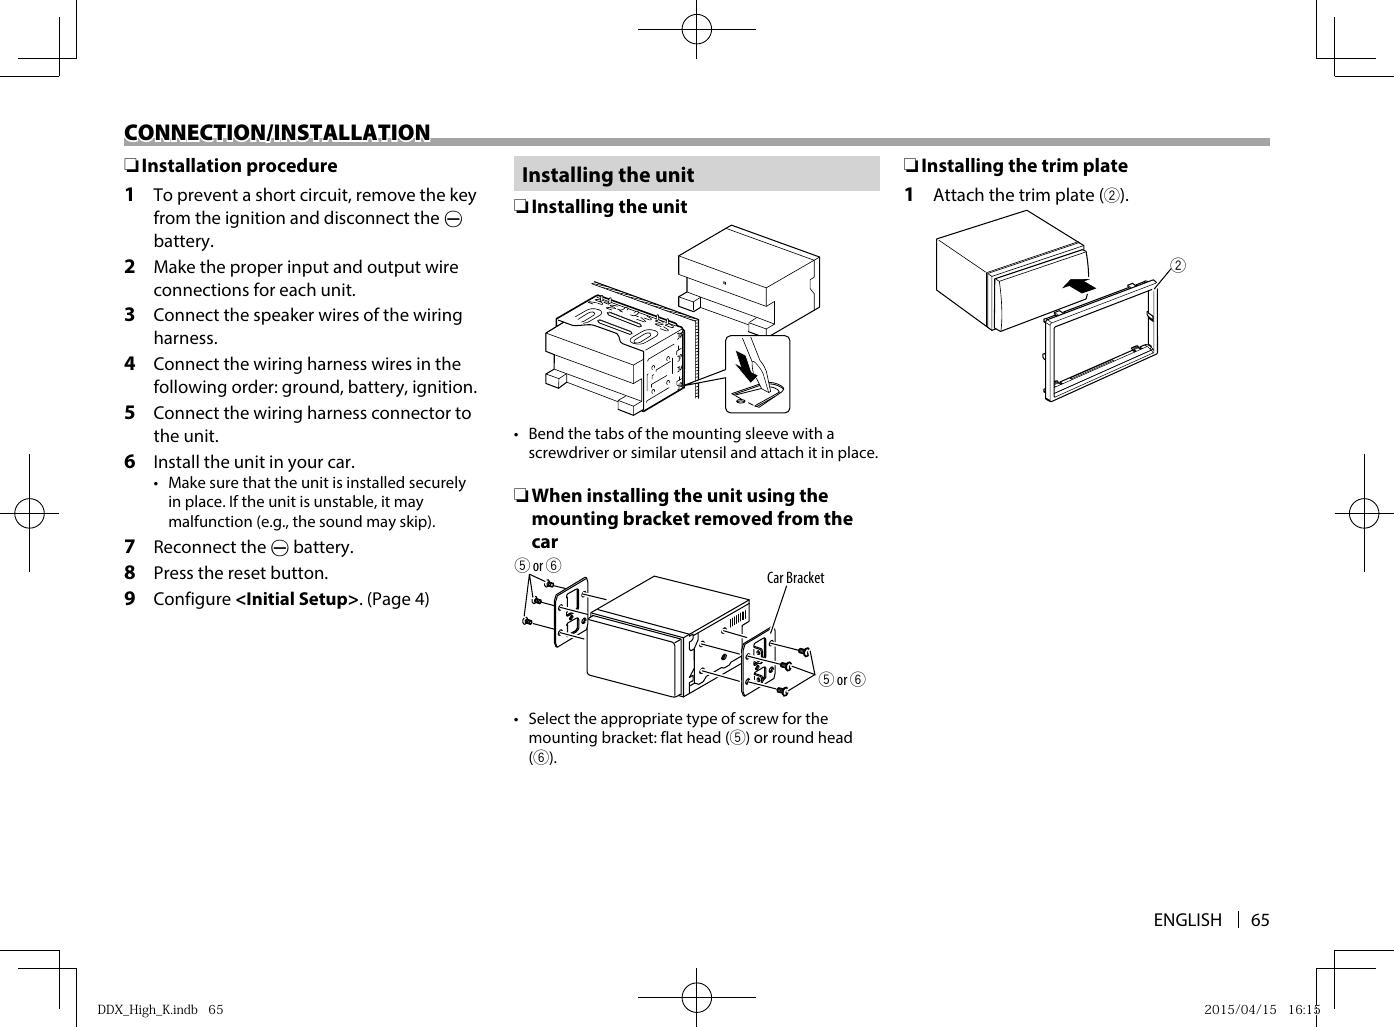 Kenwood Ddx 9702 S User Guide on